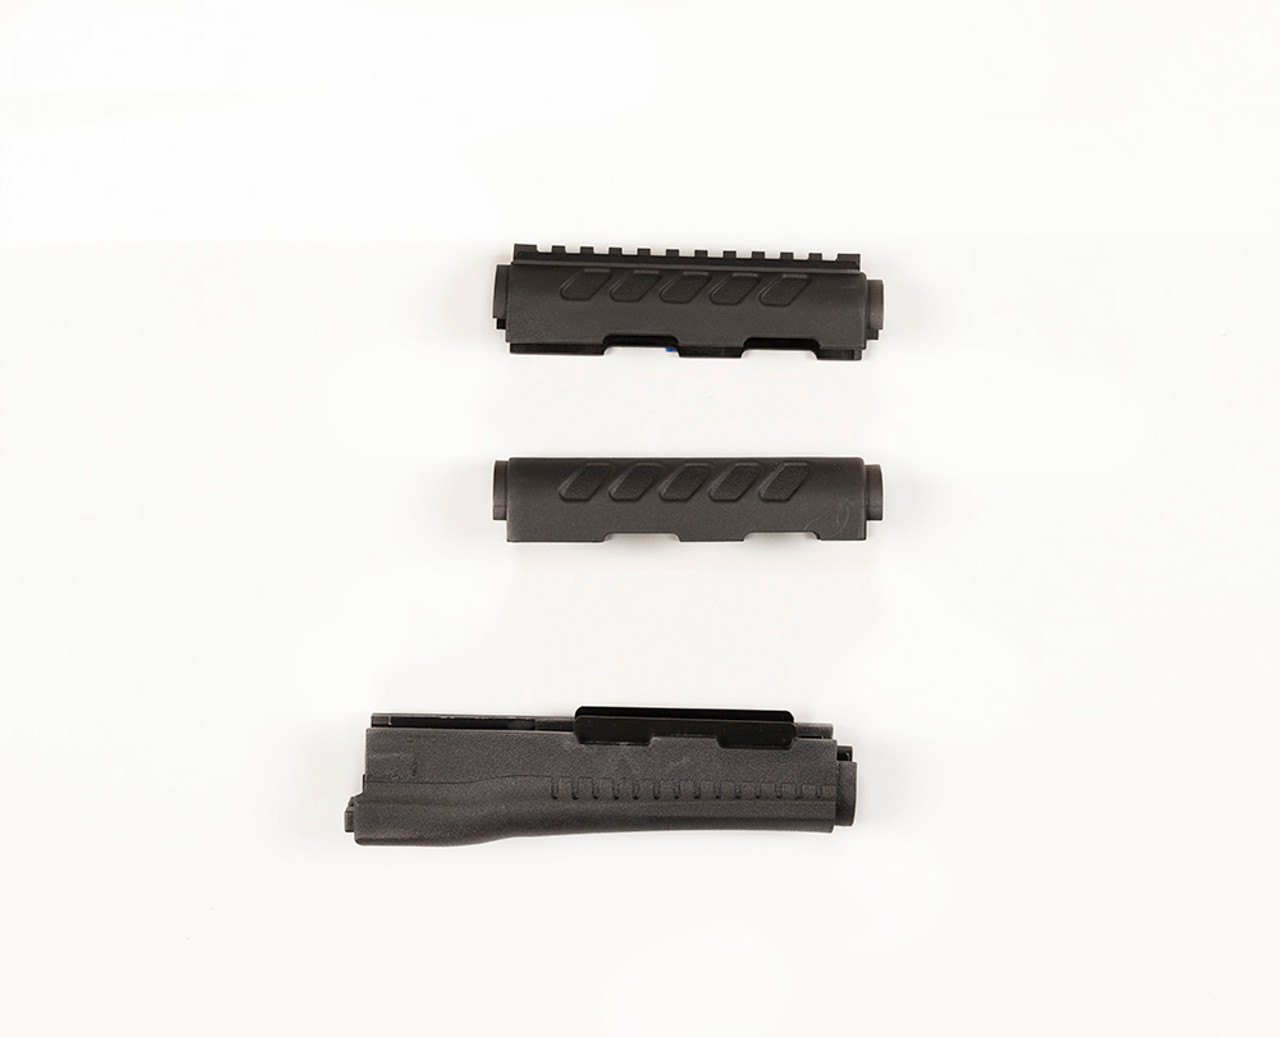 Archangel® Yugo PAP AK-Series OPFOR® Forend Set - Black Polymer